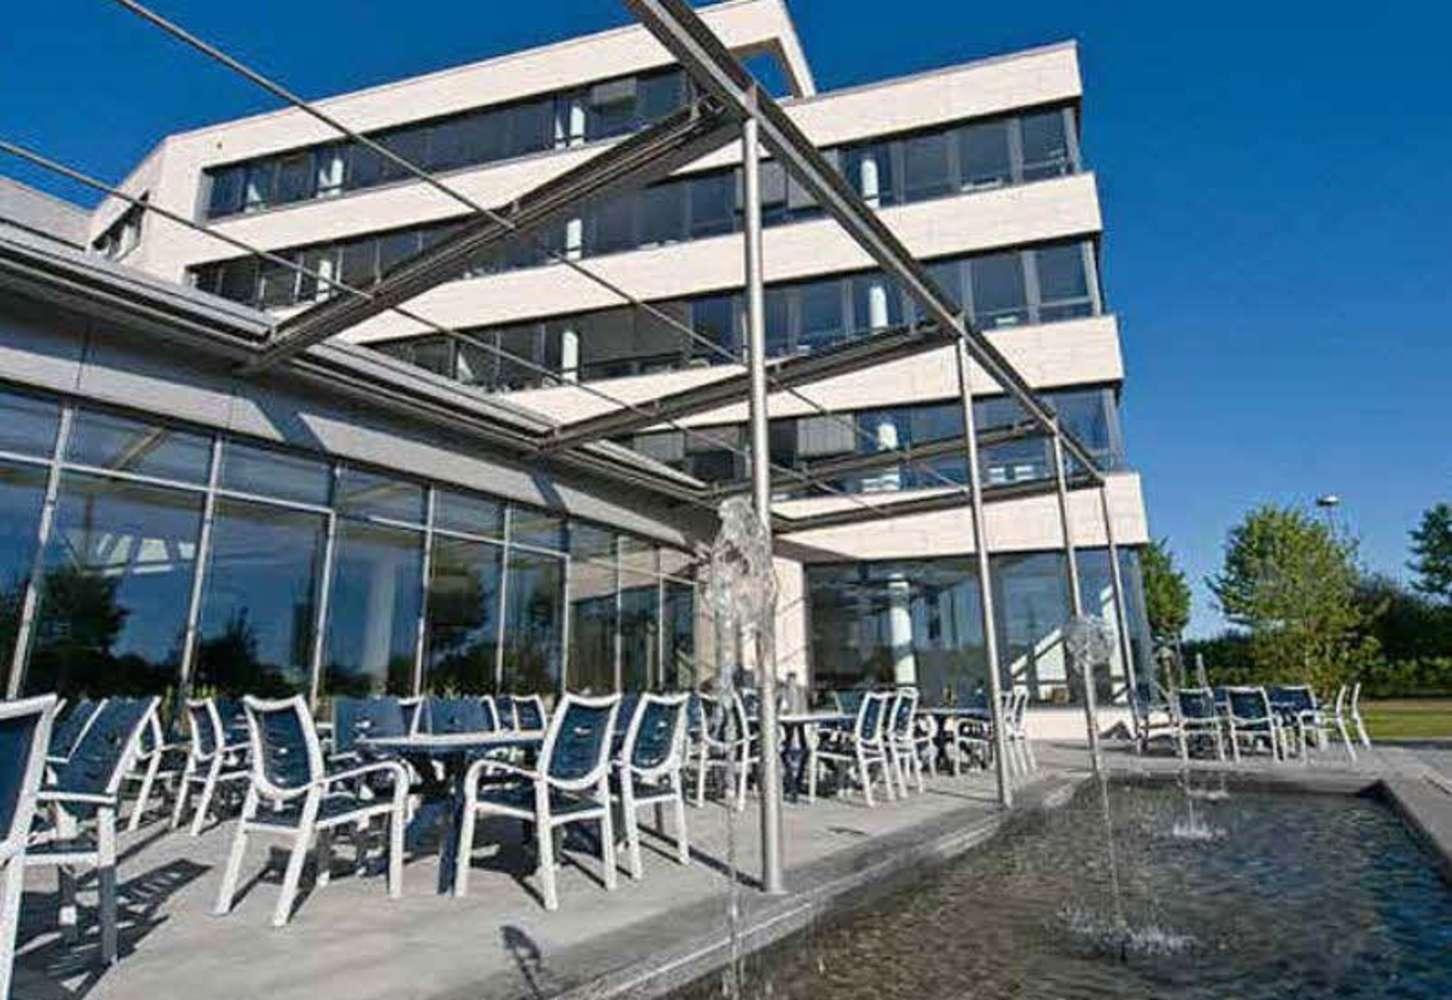 Büros Bad homburg, 61352 - Büro - Bad Homburg - F1859 - 9524878